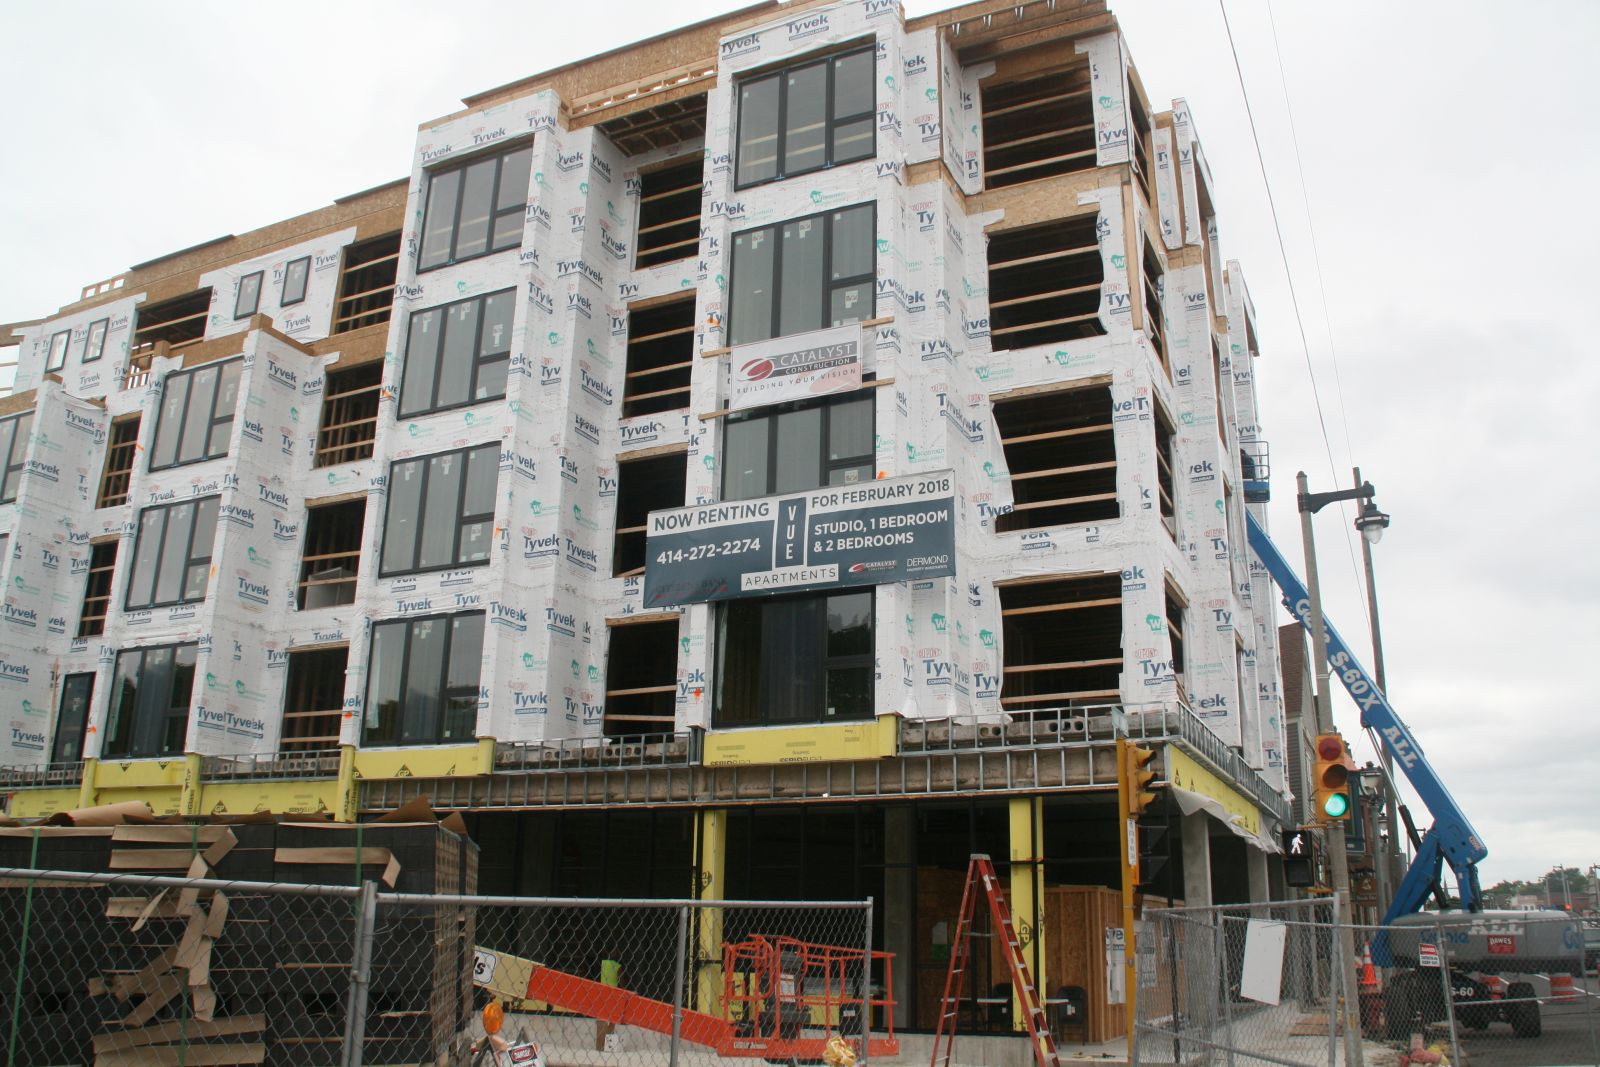 Vue Apartments » Urban Milwaukee